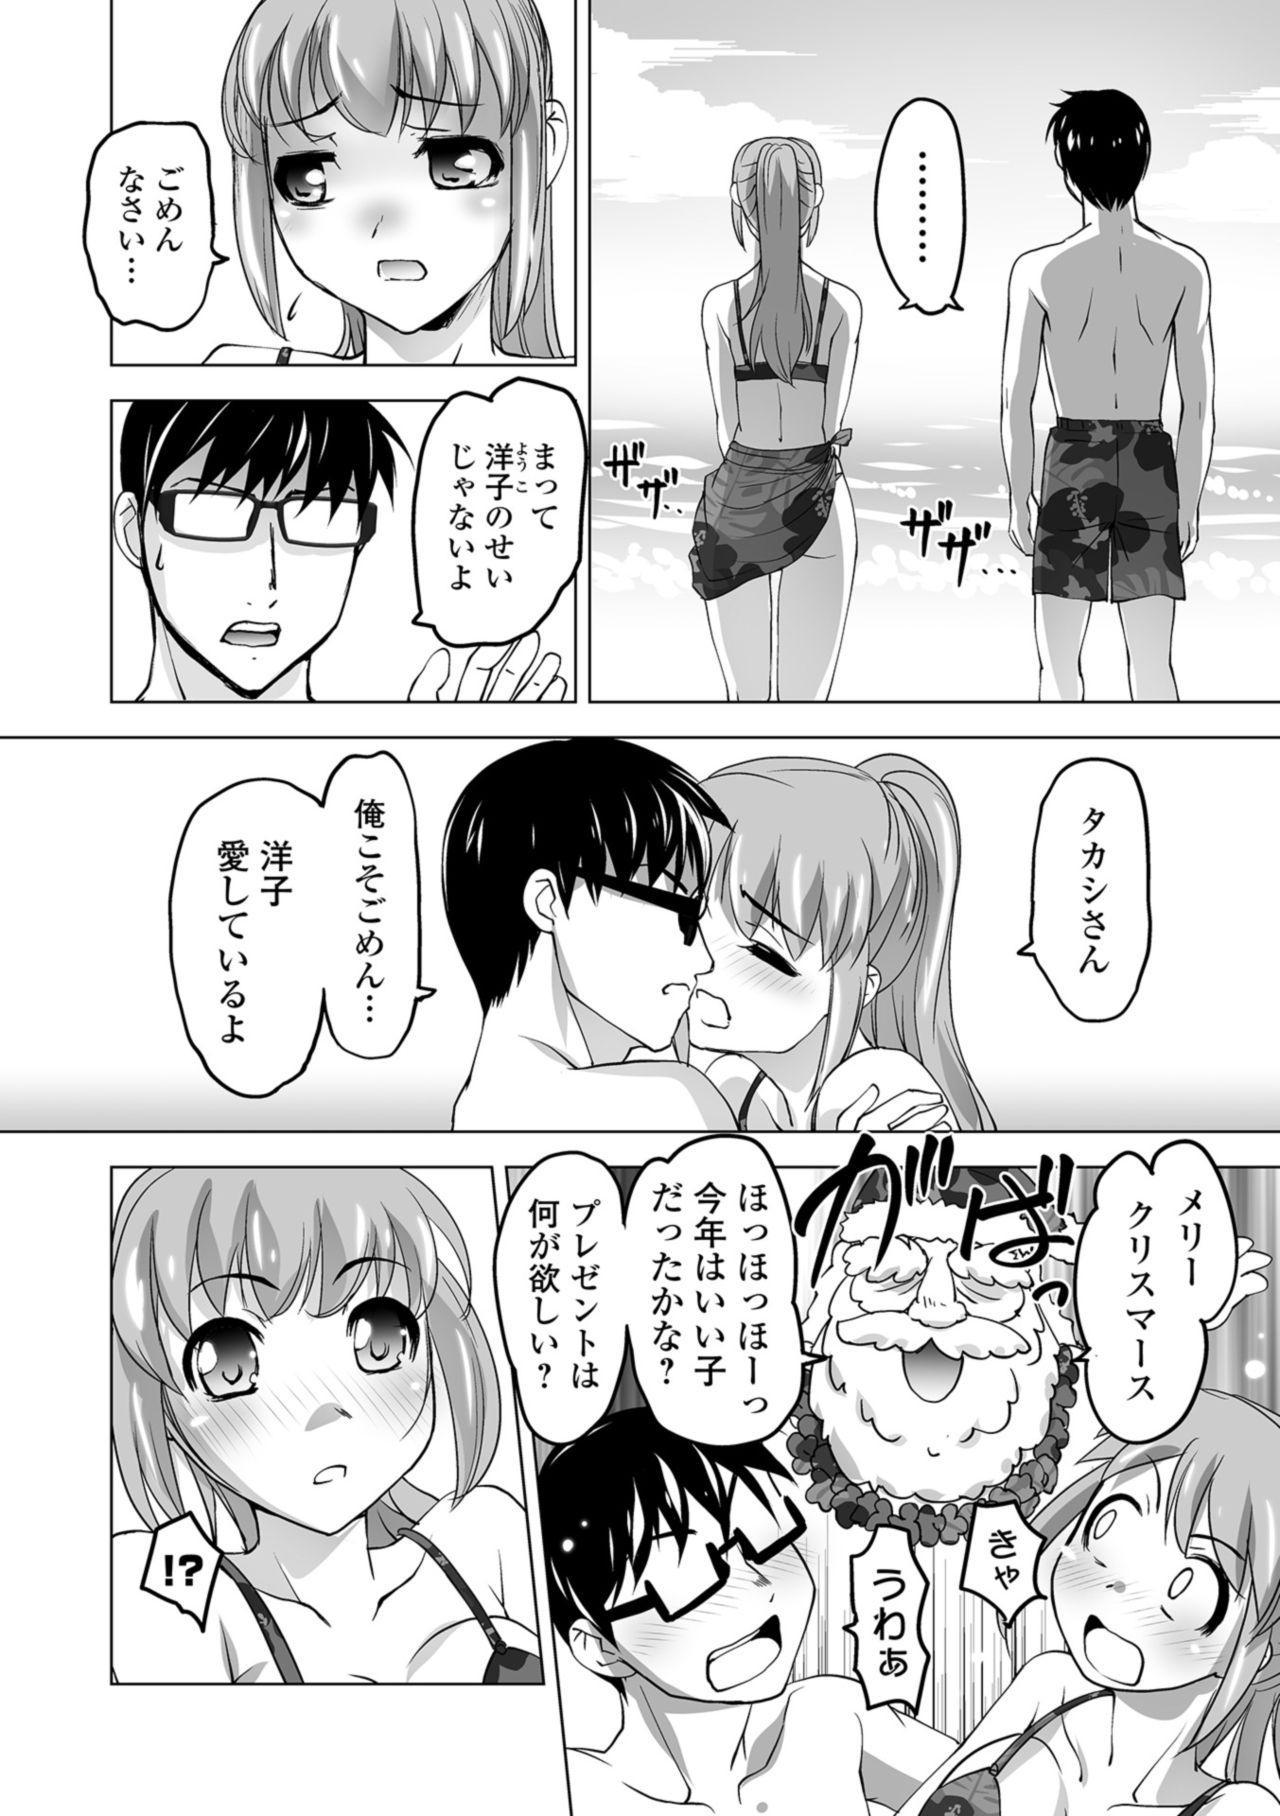 COMIC Shigekiteki SQUIRT!! Vol. 09 121